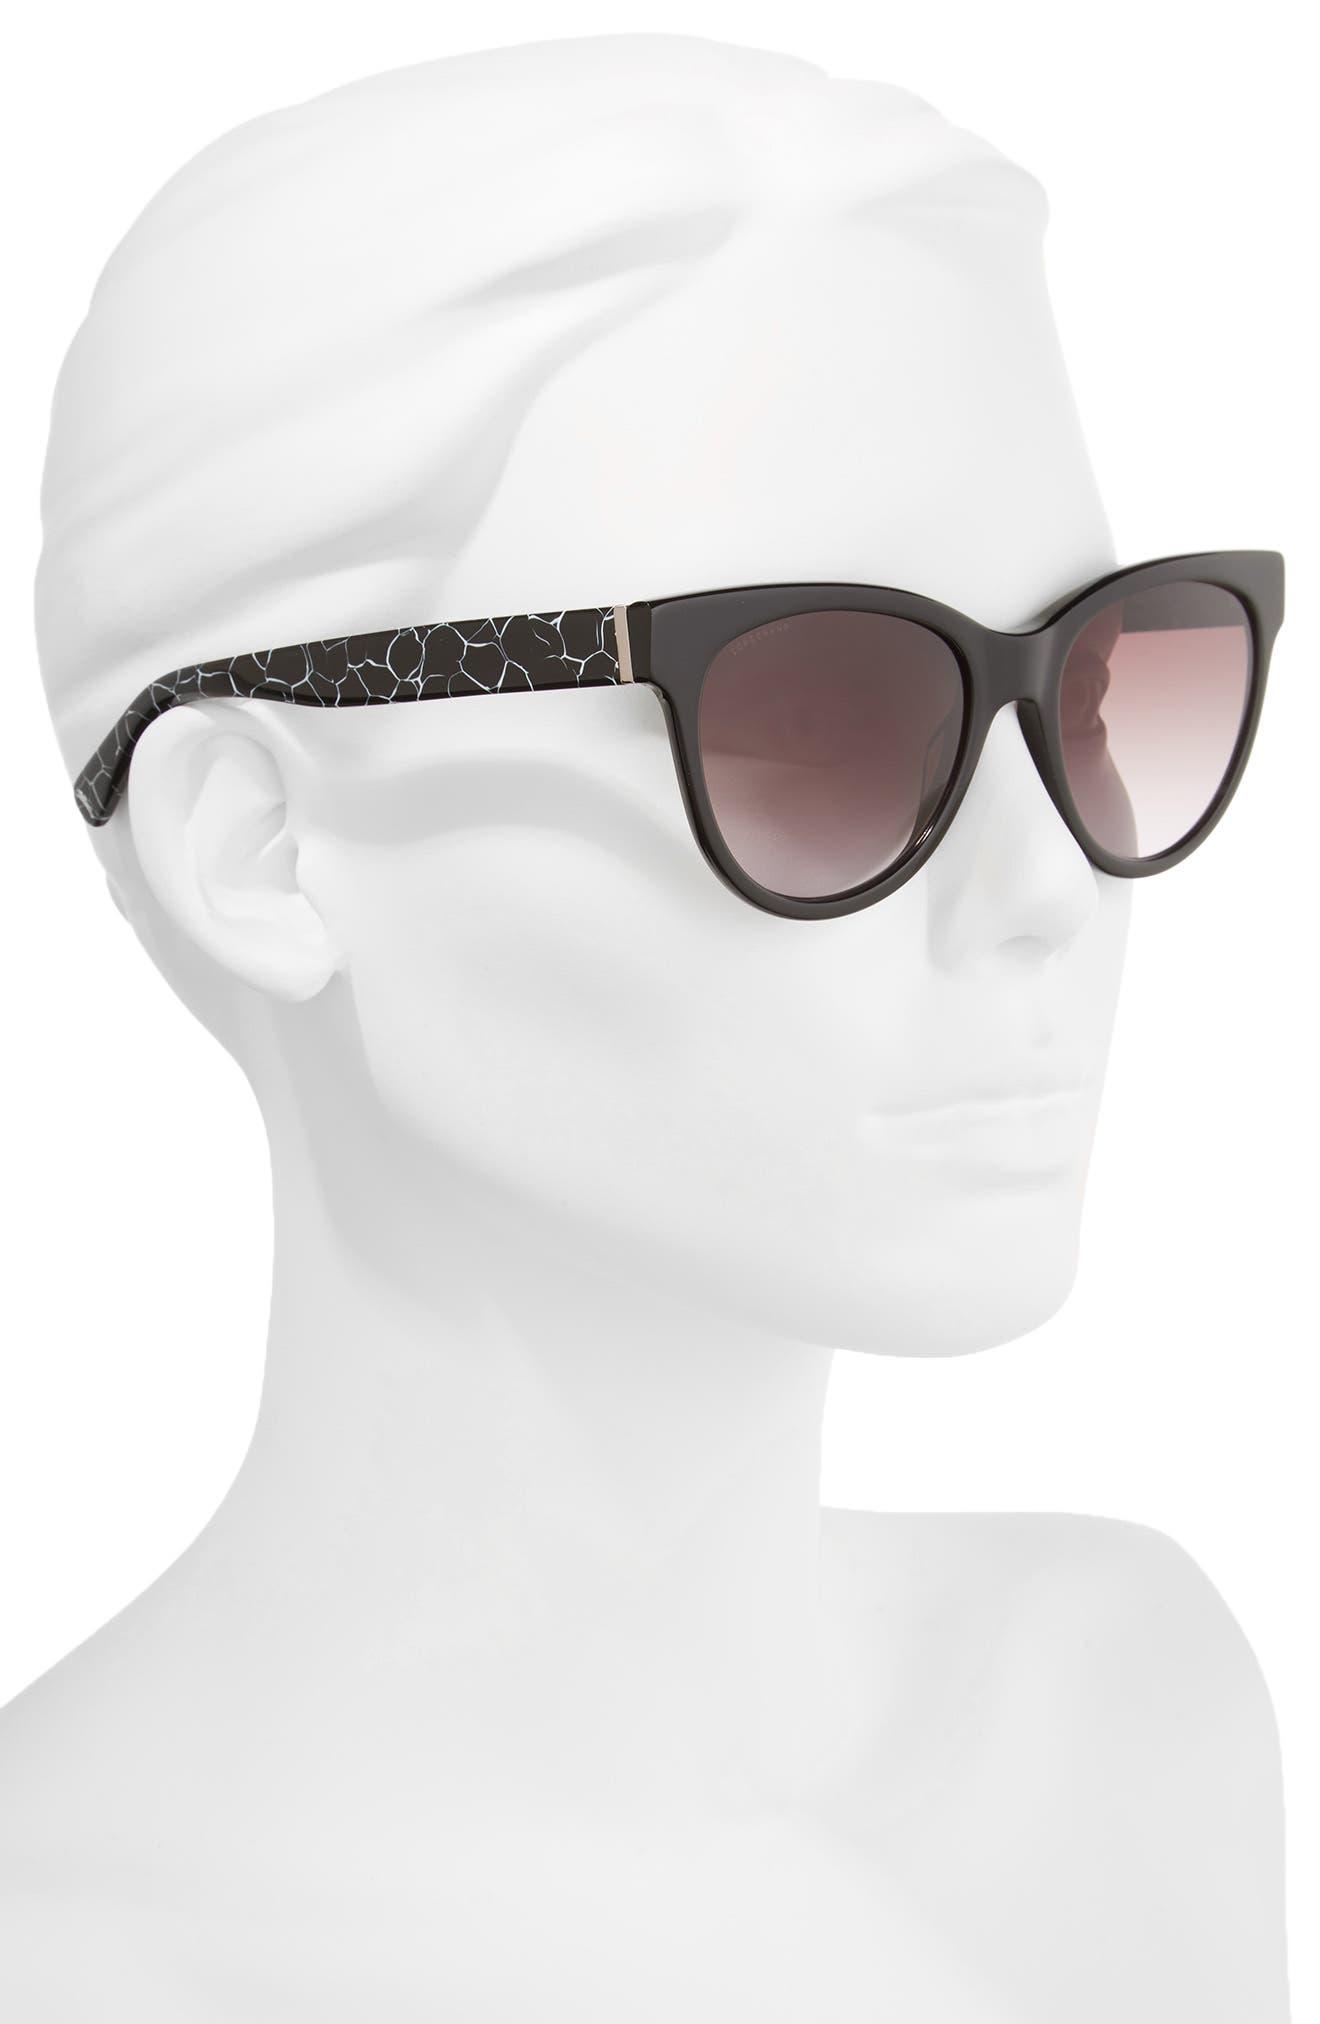 54mm Gradient Lens Cat Eye Sunglasses,                             Alternate thumbnail 2, color,                             MARBLE BLACK